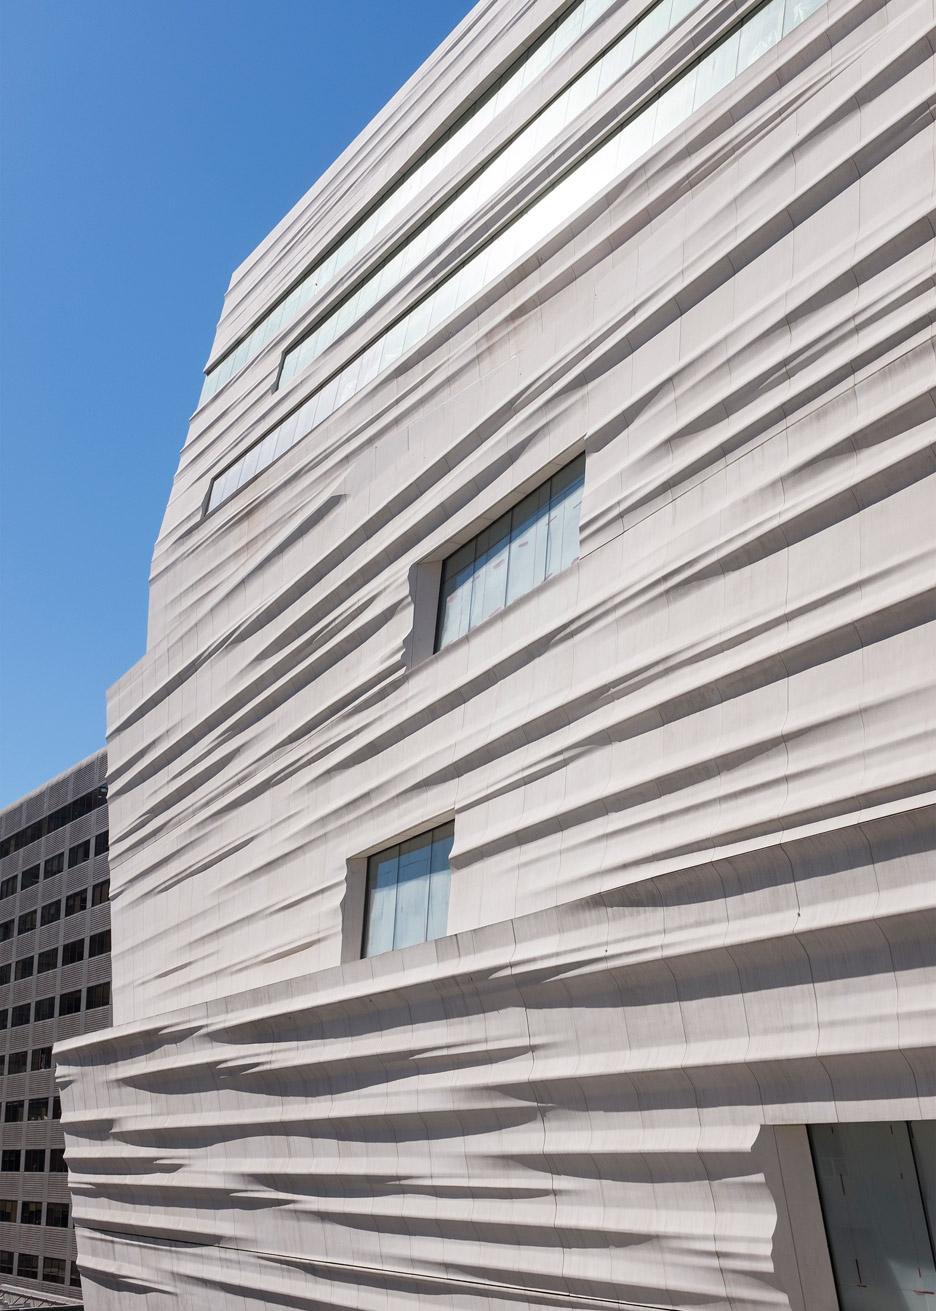 sfmoma-snohetta-cultural-museum-san-francisco-construction-boom-architecture-news-usa-iwan-baan_dezeen_936_23